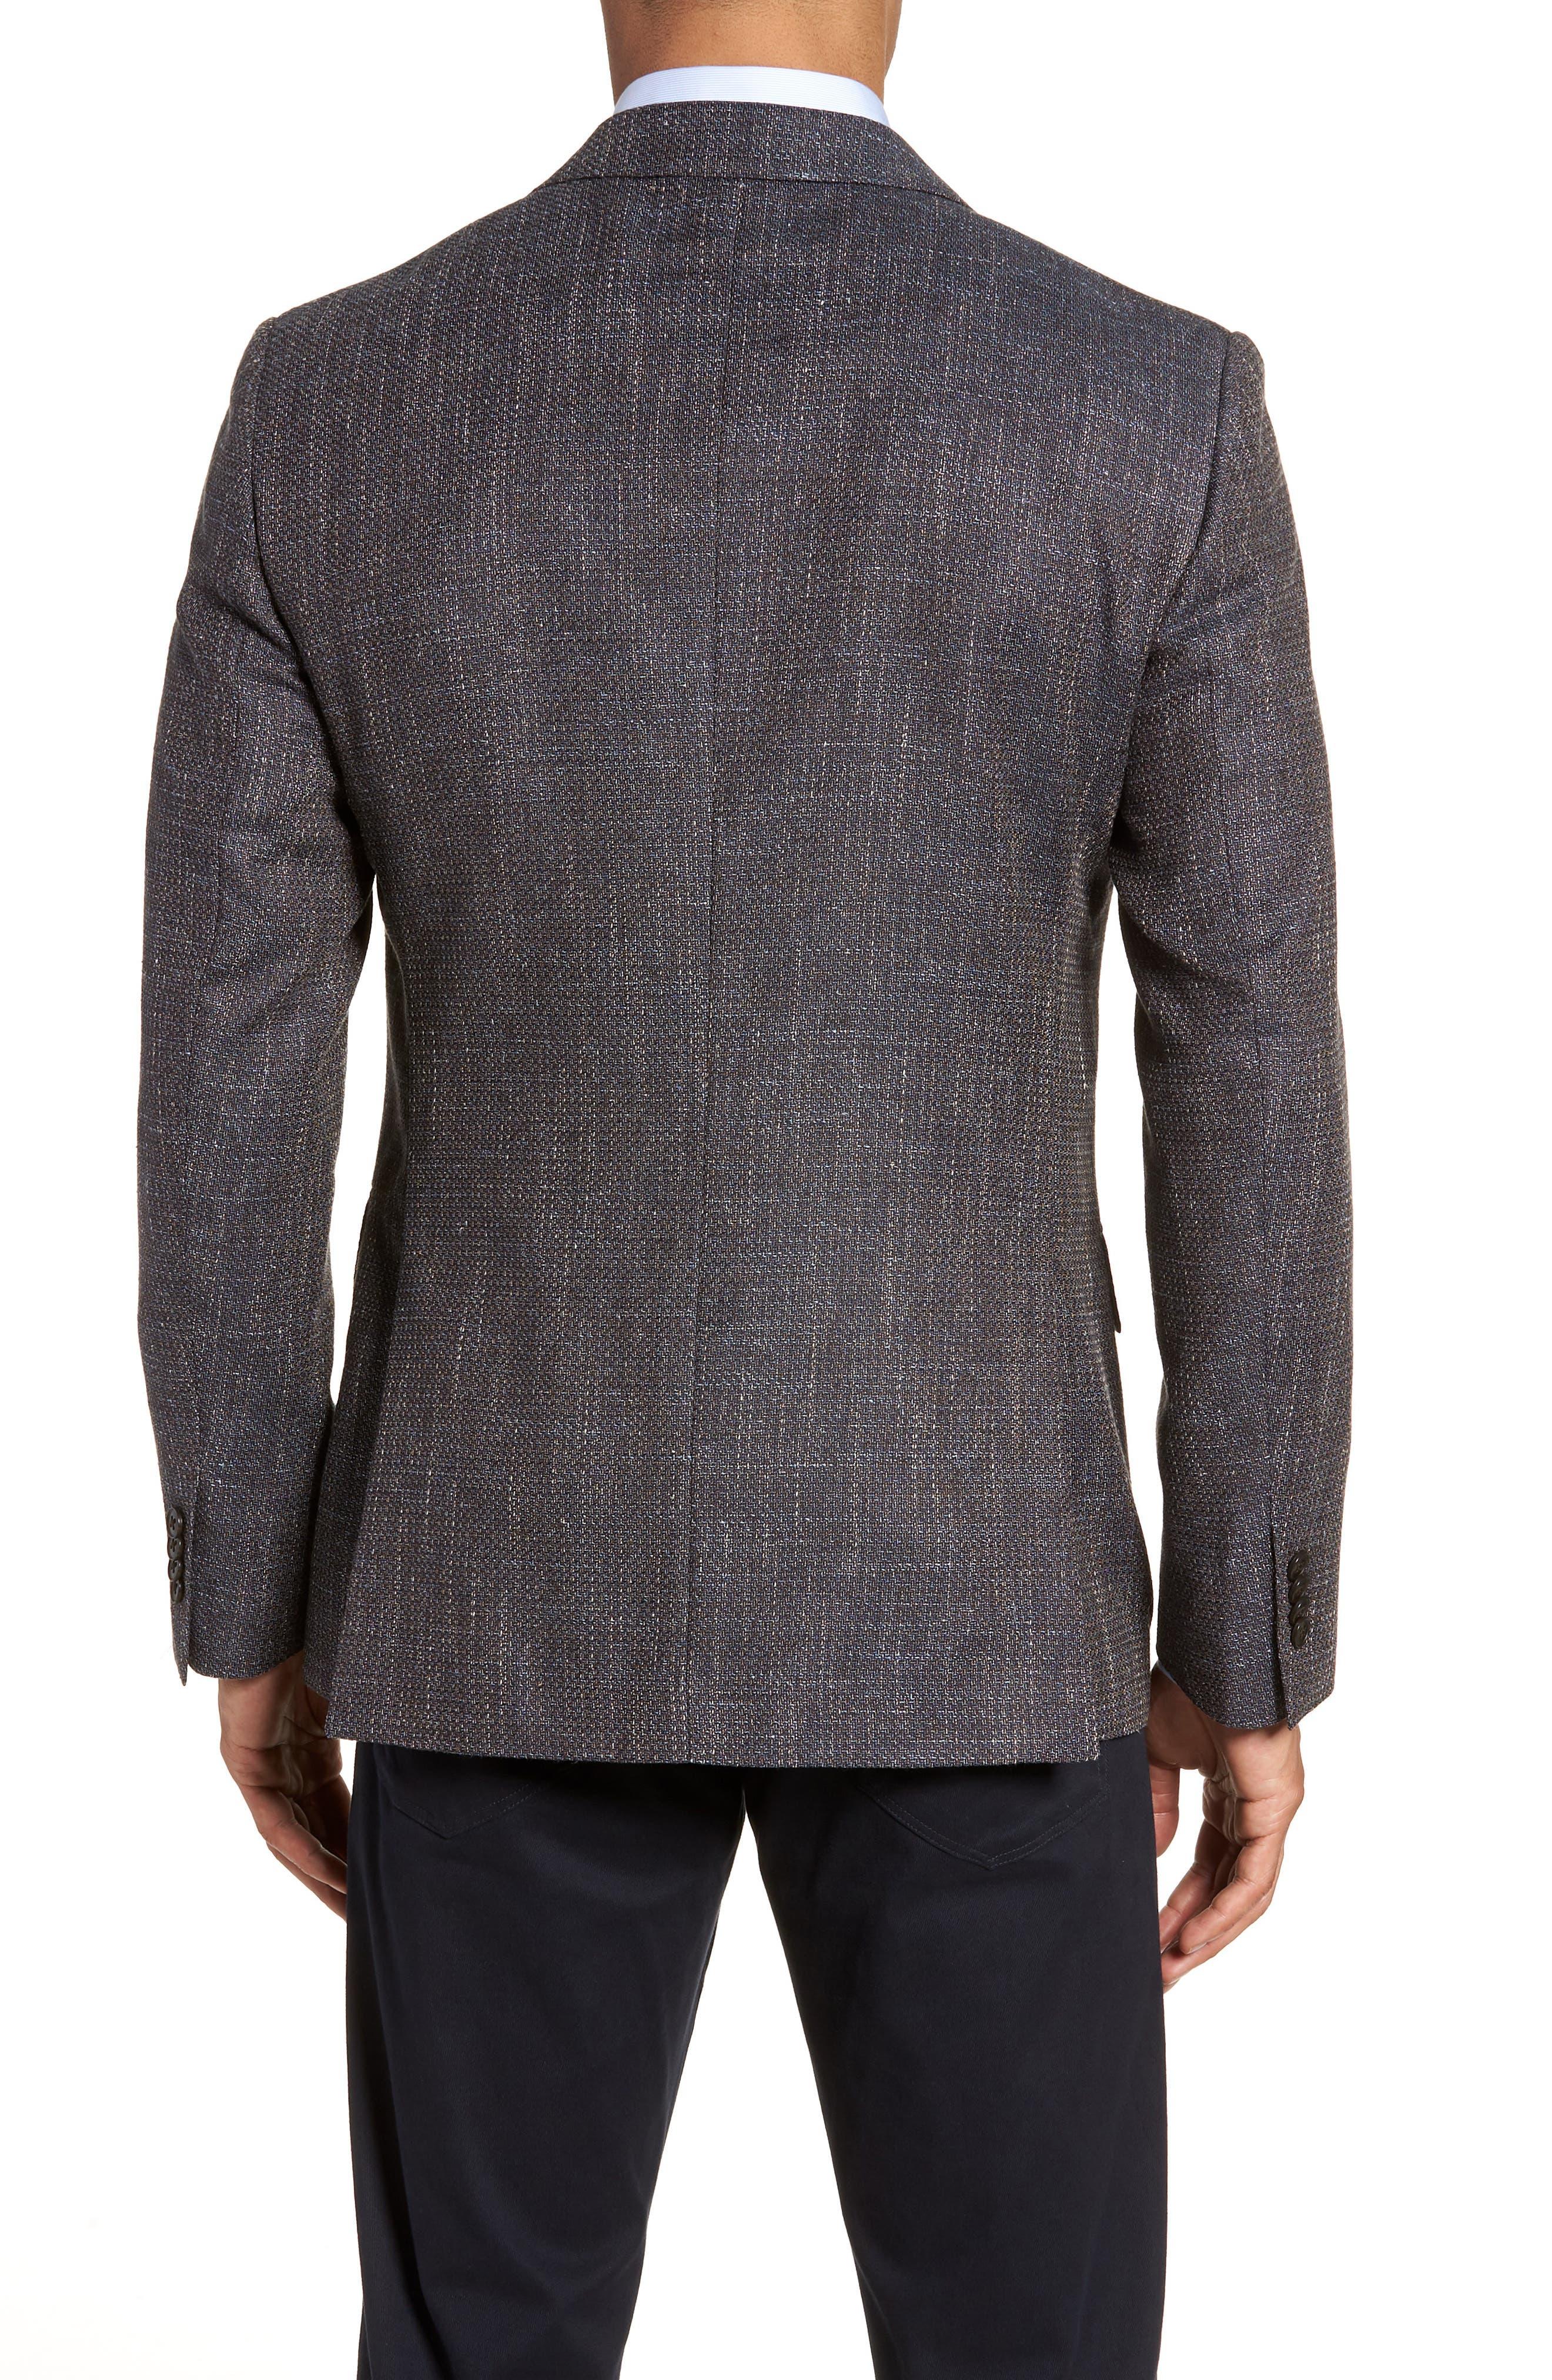 Five Bridges Slim Fit Tweed Sport Coat,                             Alternate thumbnail 2, color,                             Sepia